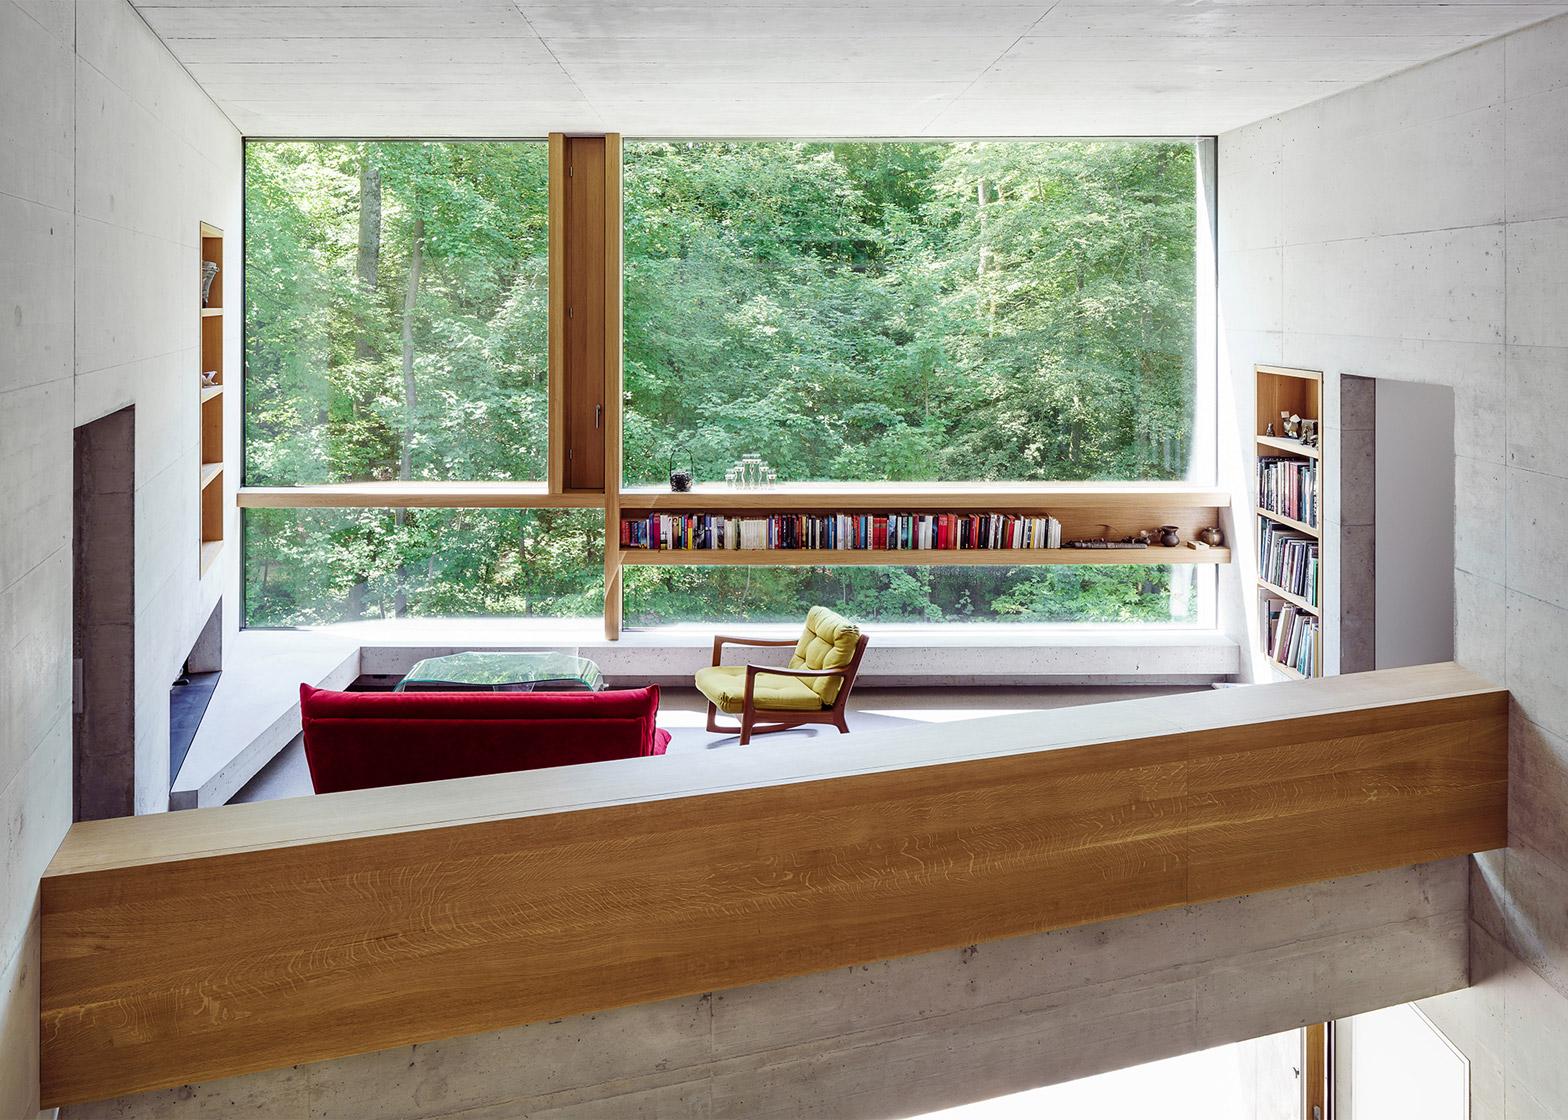 Crystalline house by Daluz Gonzalez Architekten has nest-like roof ...